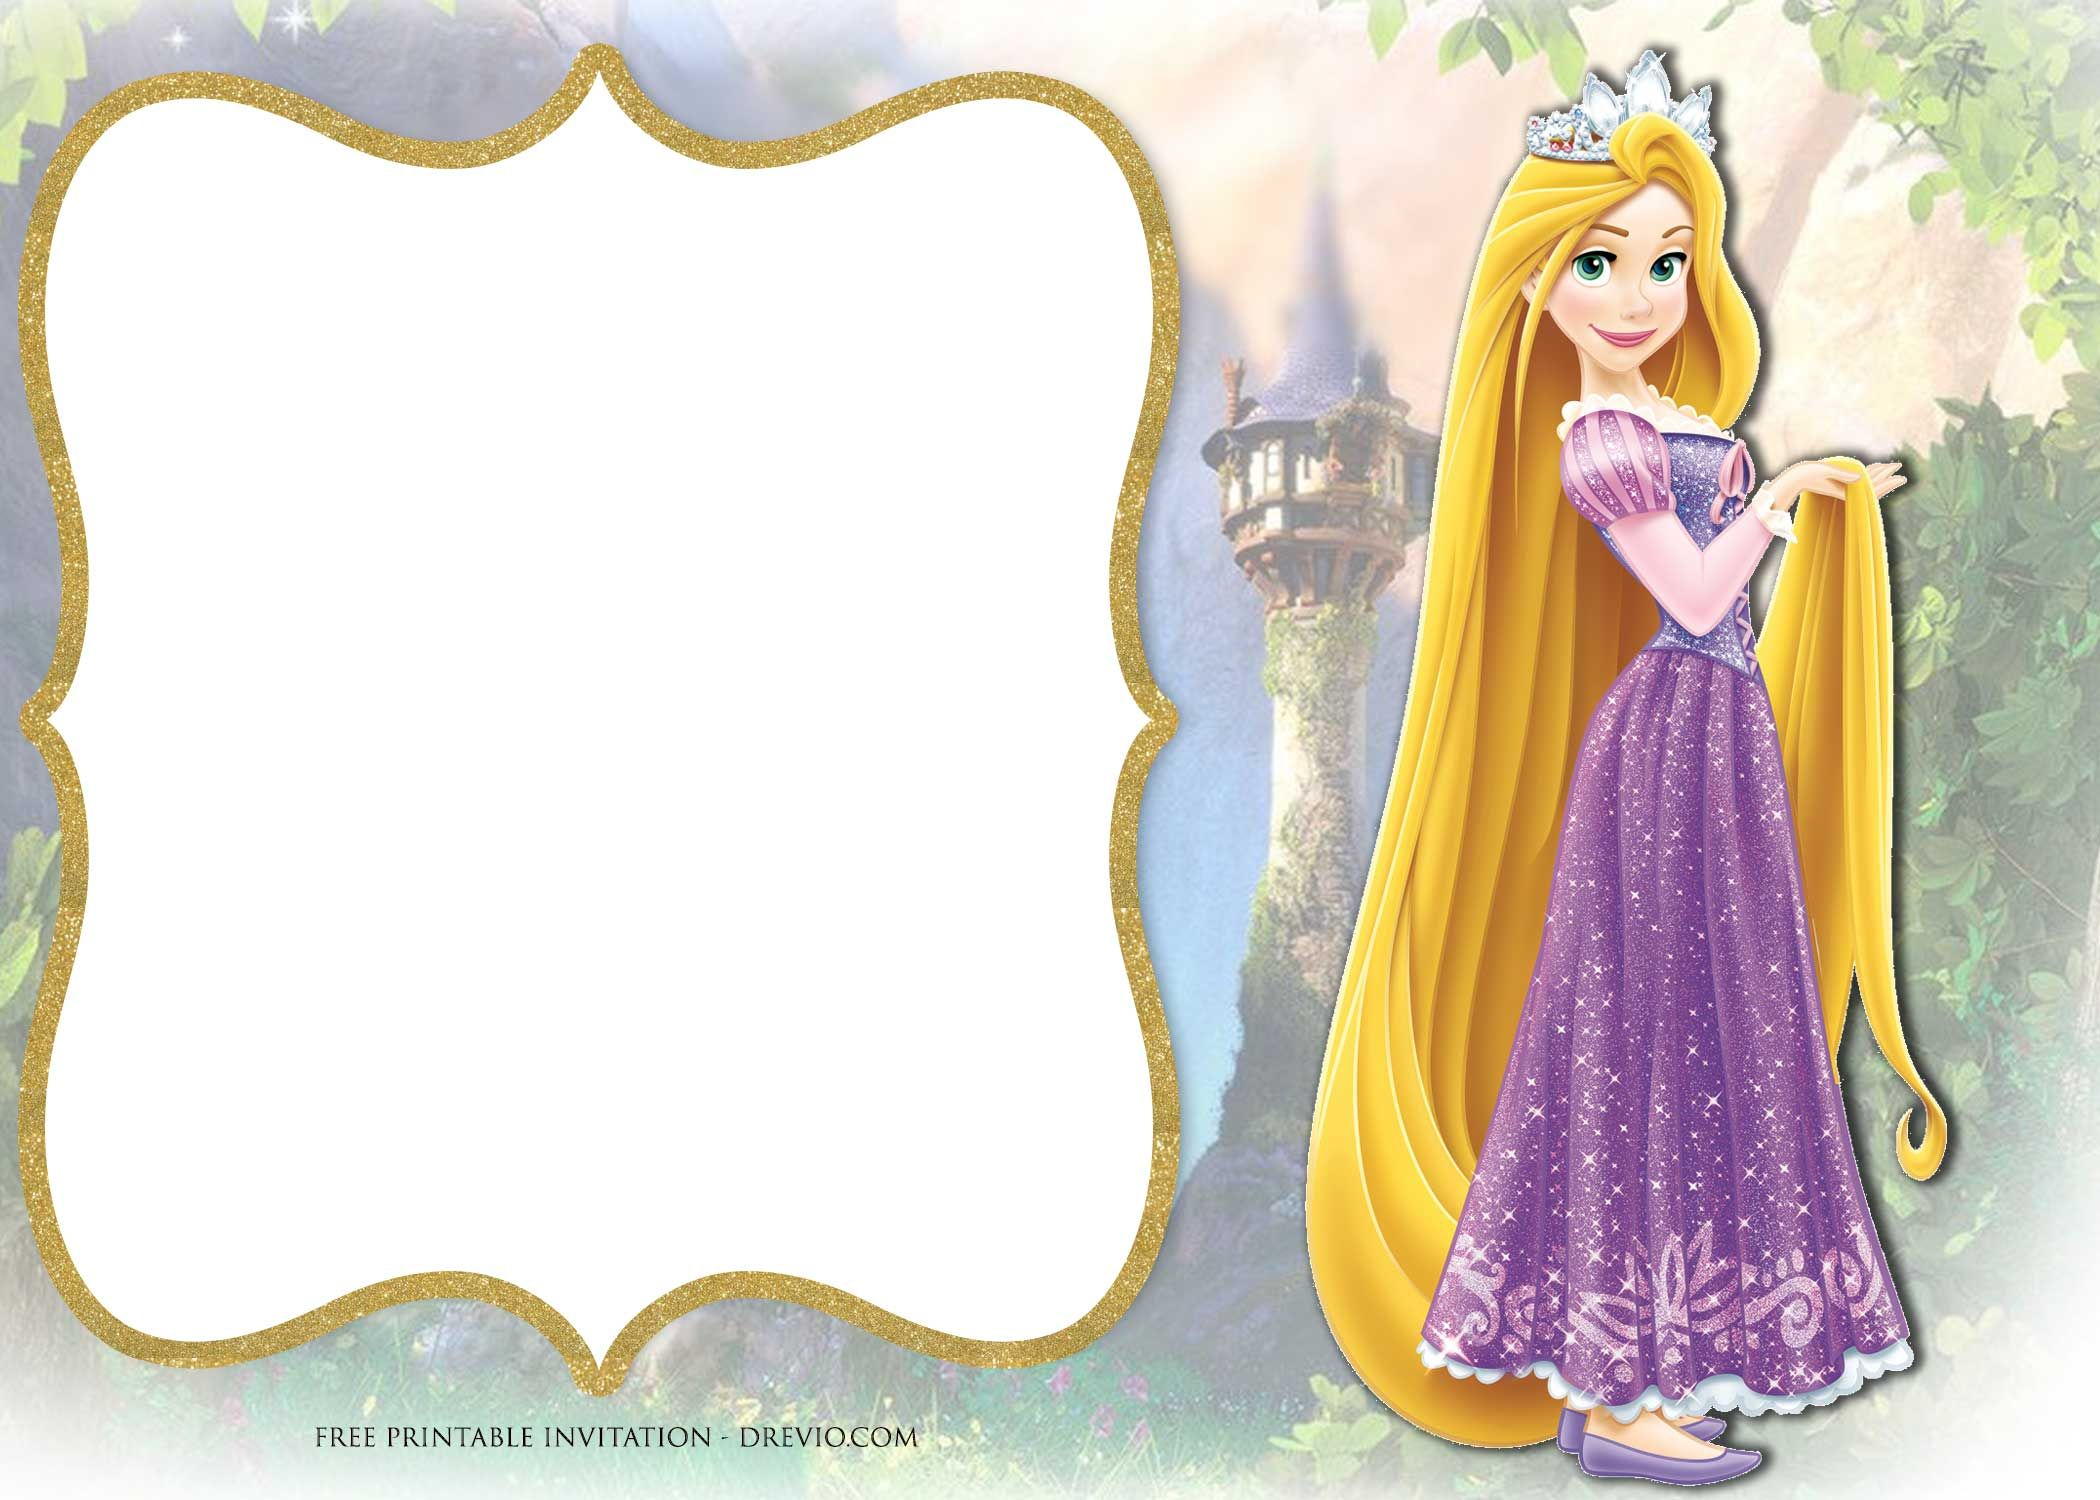 Free Printable Princess Rapunzel Invitation